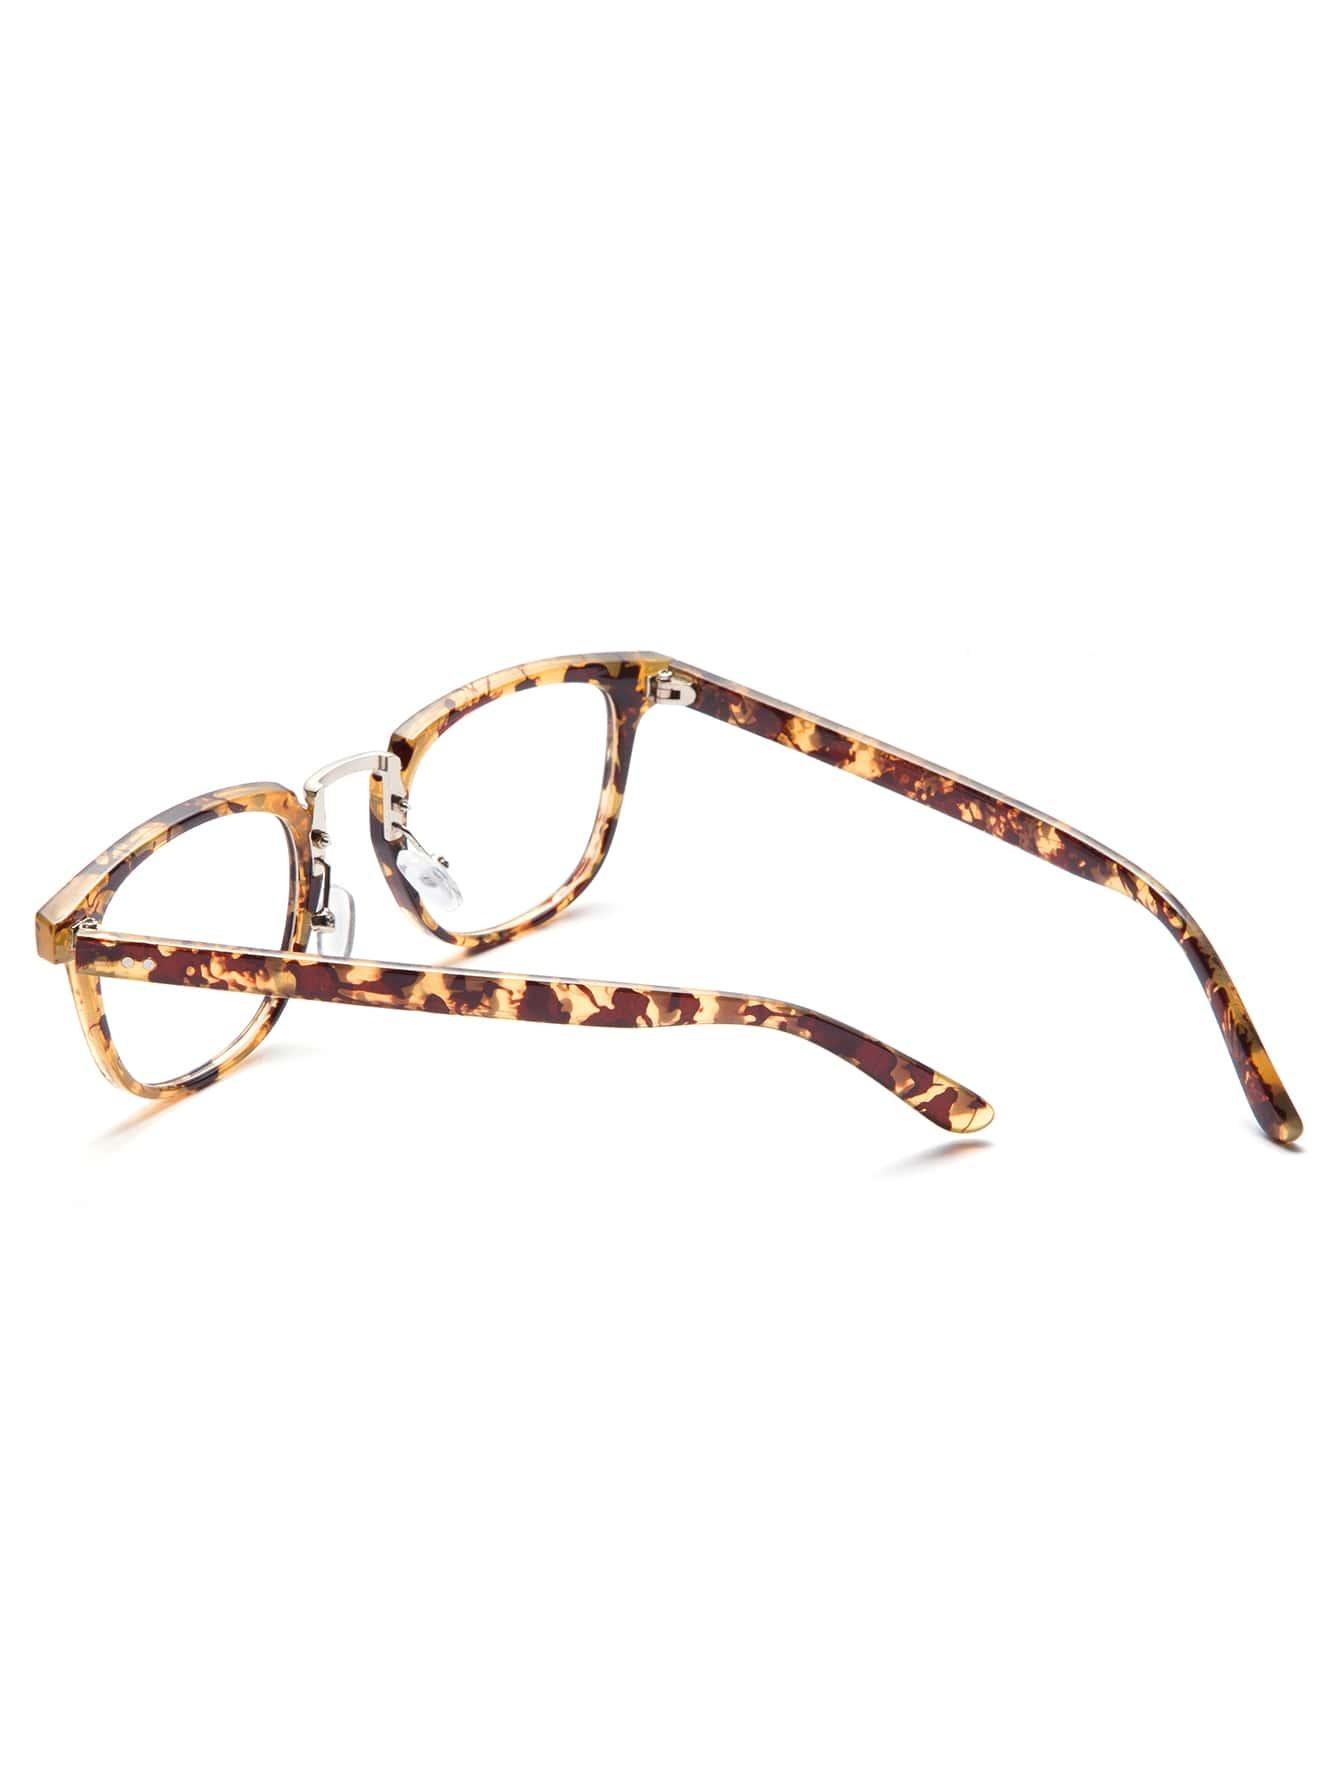 Brown Tortoise Frame Clear Lens Glasses -SheIn(Sheinside)